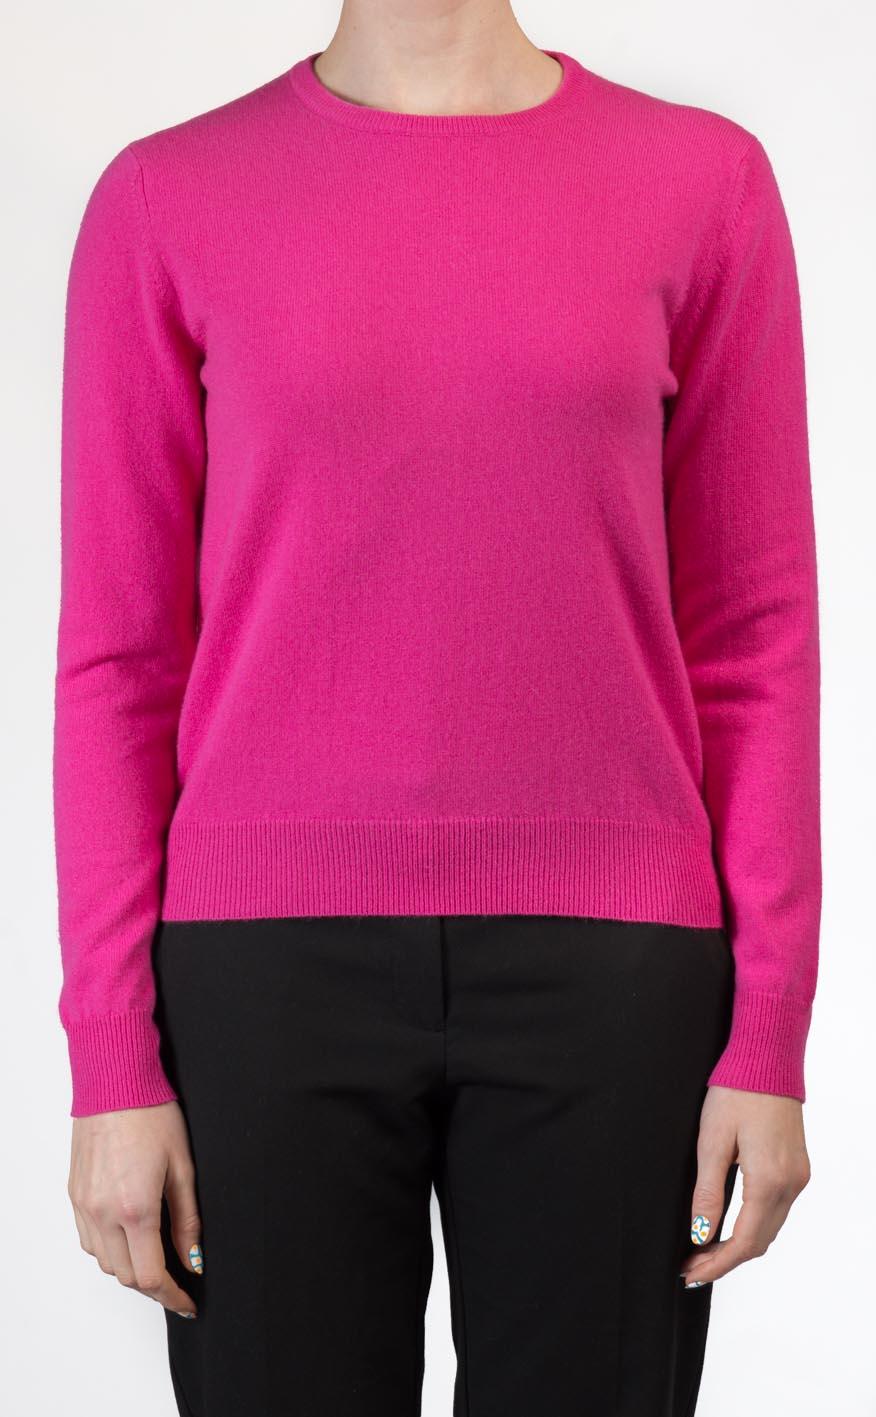 Ladies Cashmere Crew Neck Sweater by Scotweb